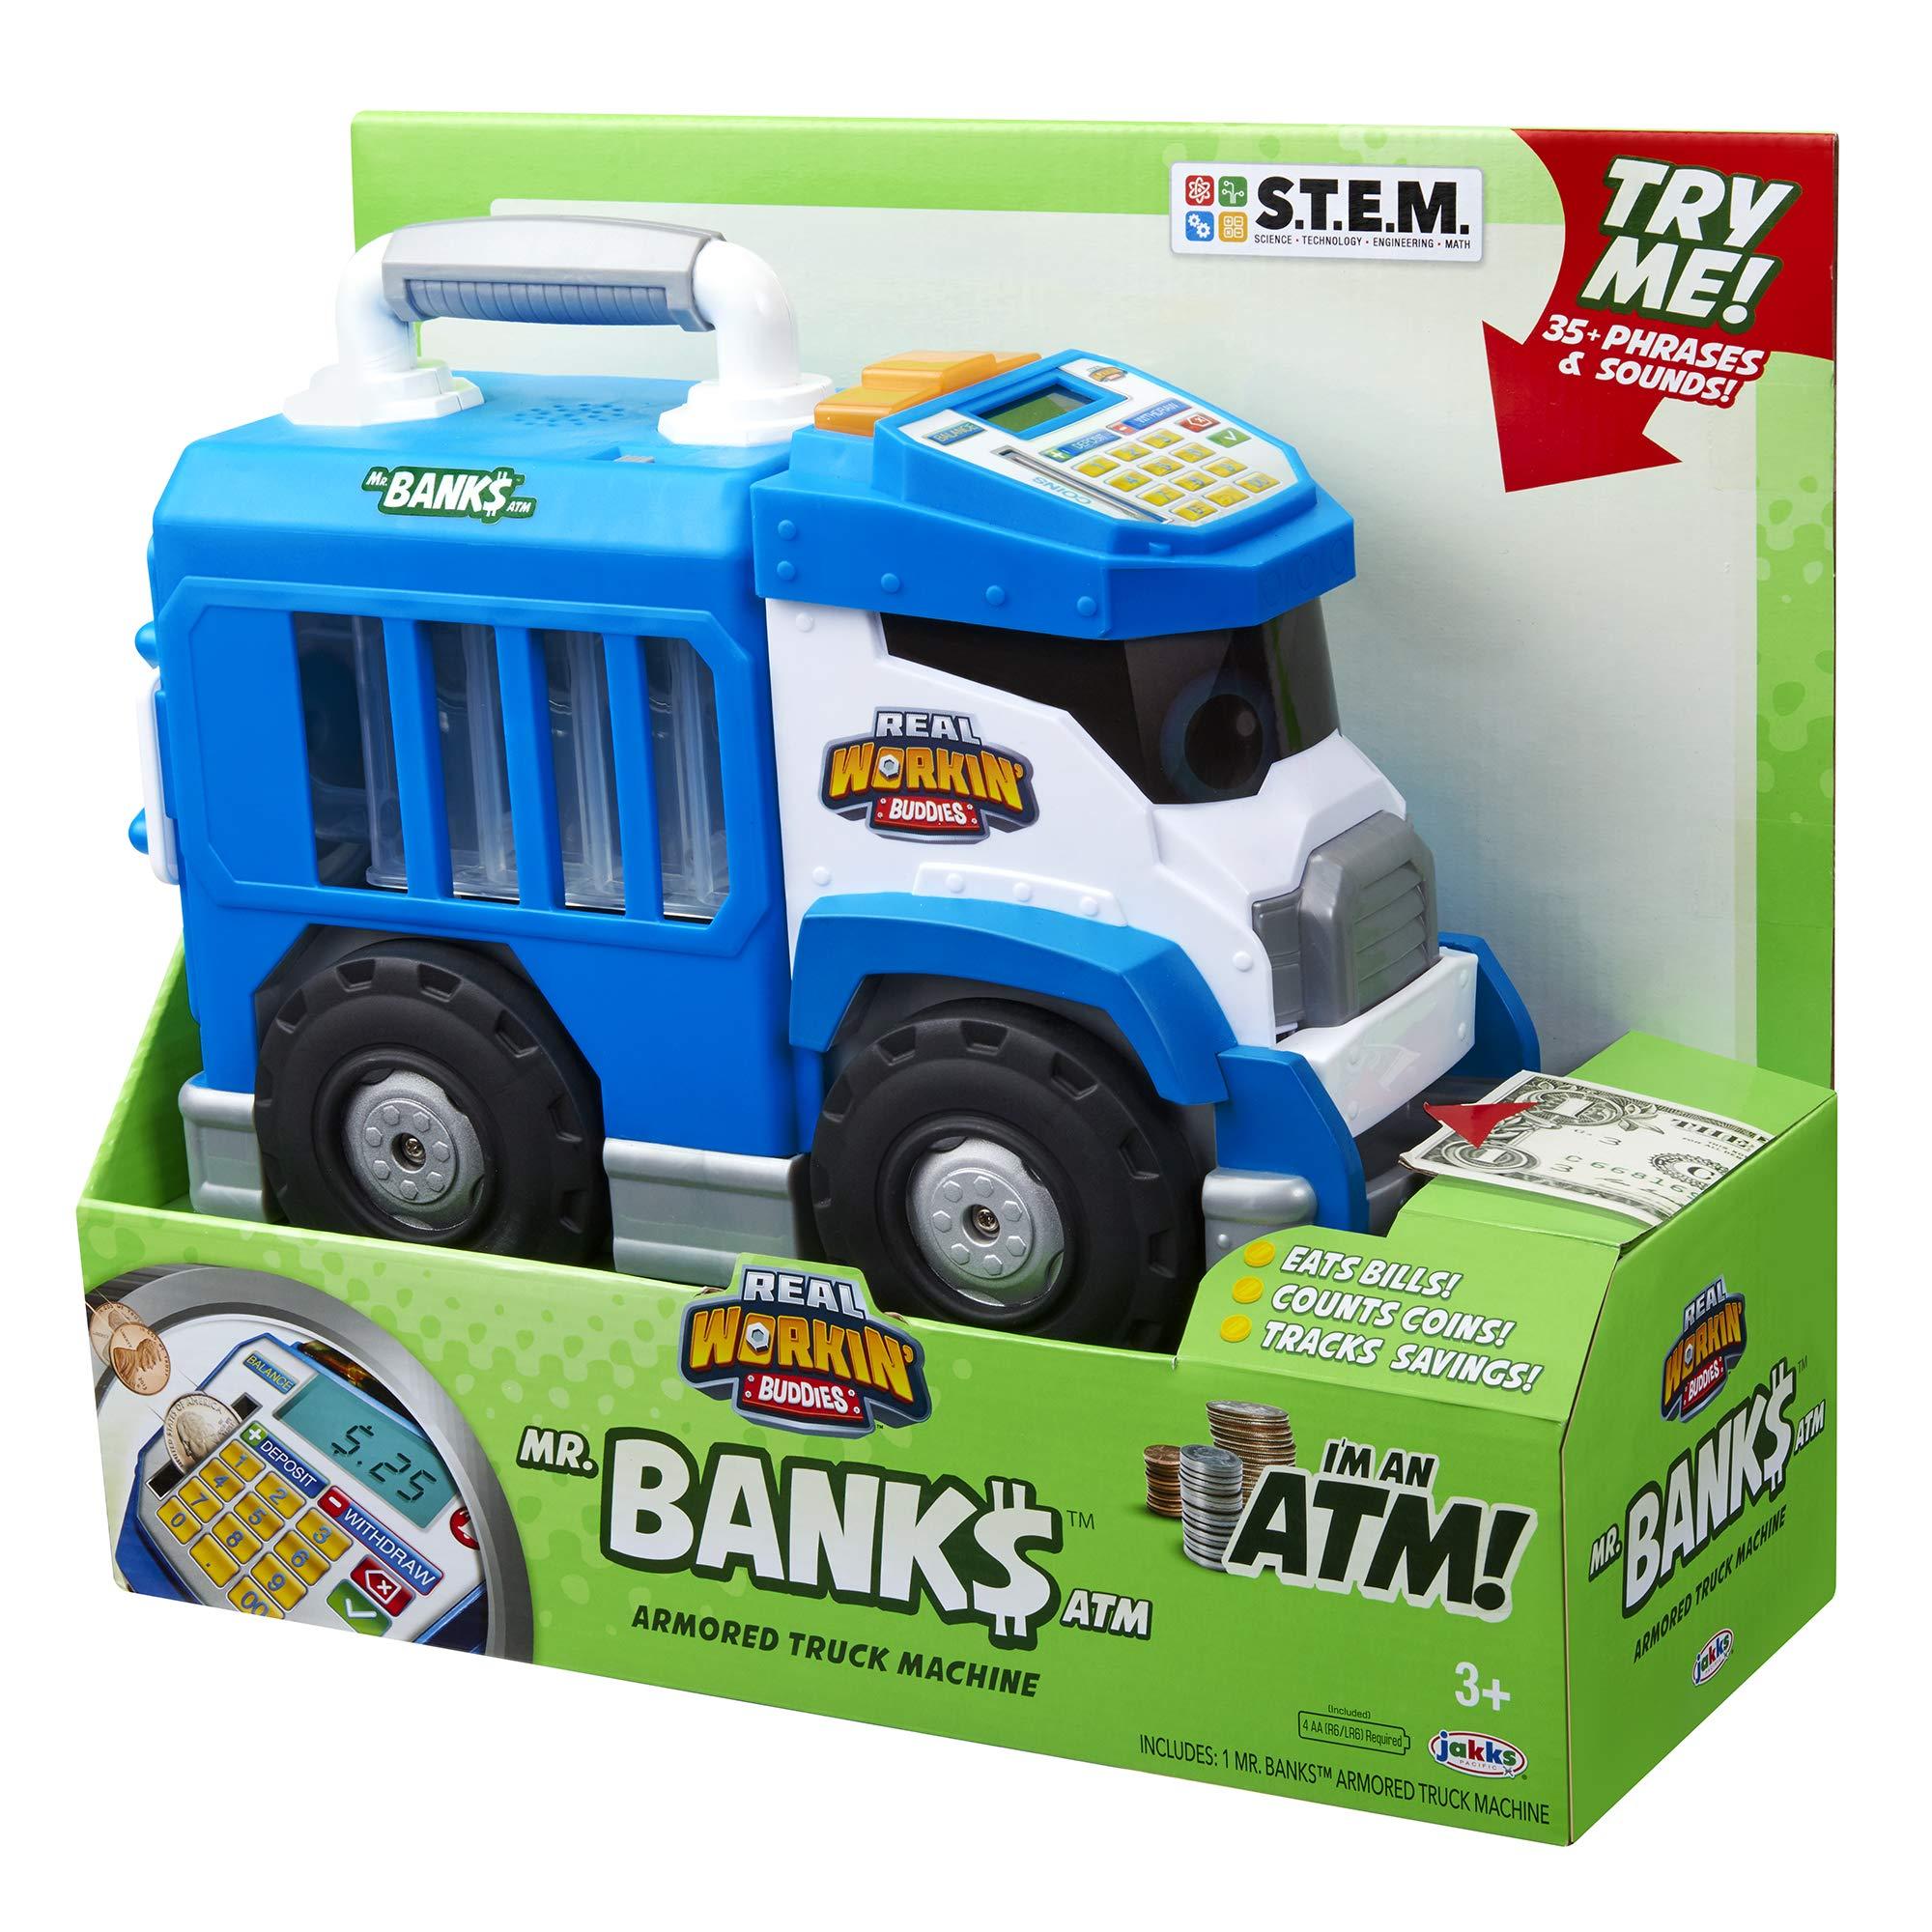 Real Workin' Buddies Mr. Banks, The Super Duper Money Saving Truck Toy Vehicle